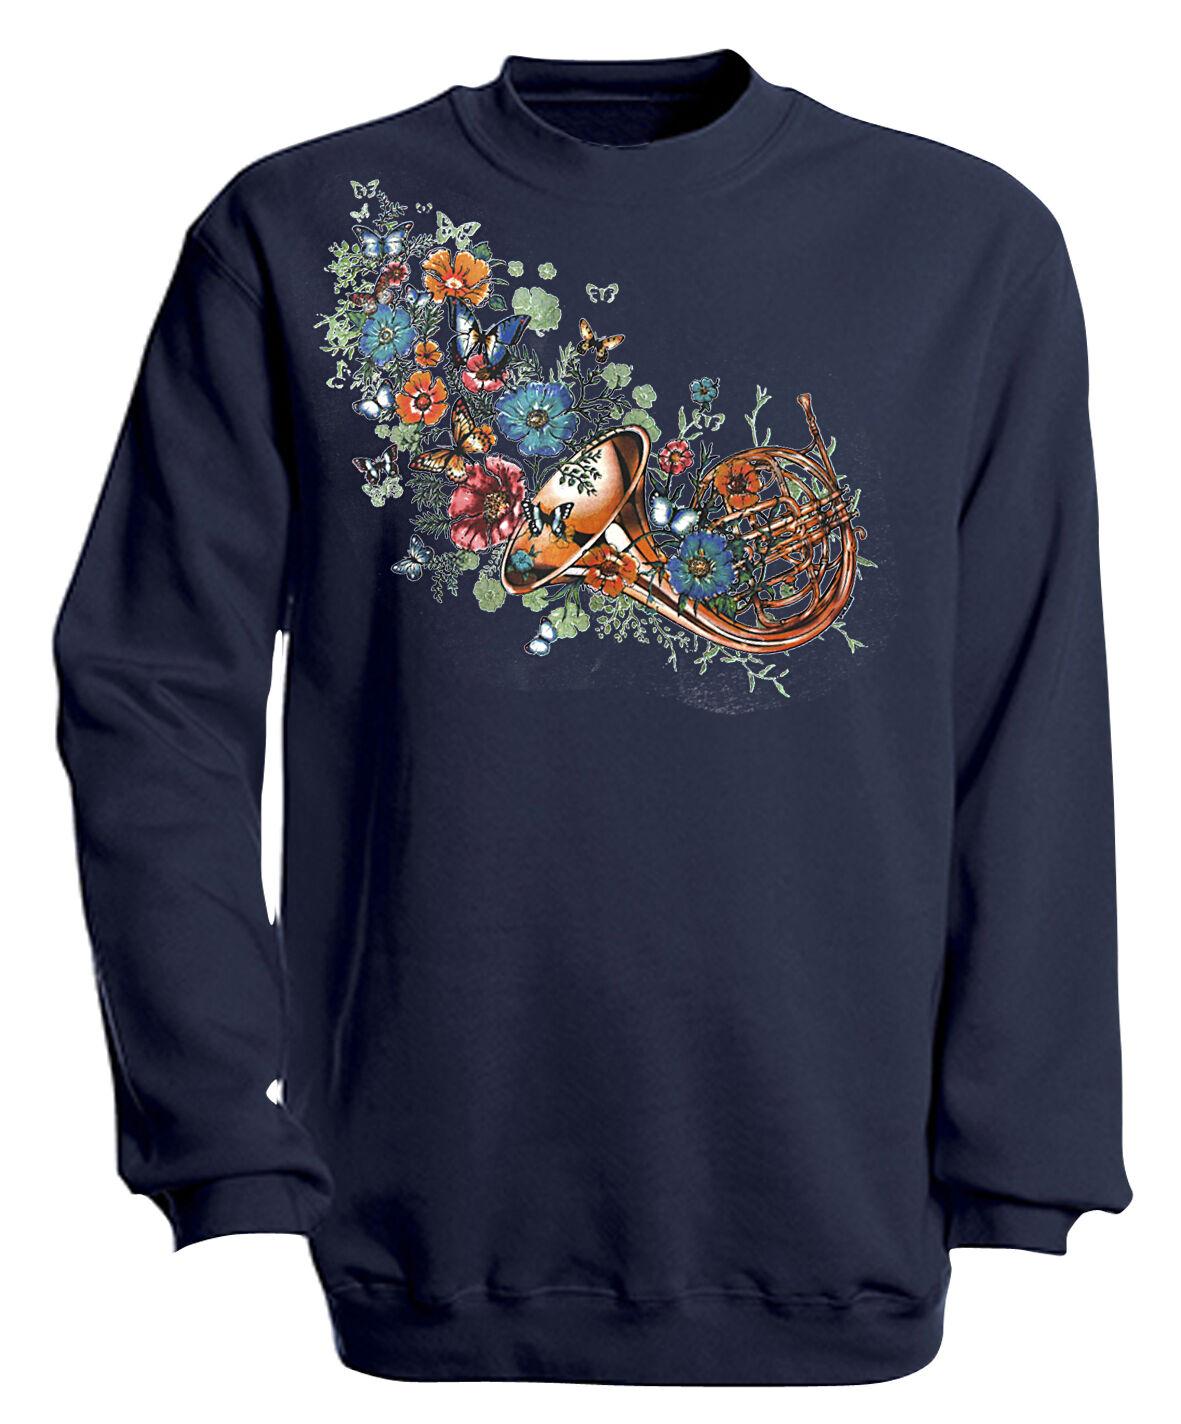 (10283-1 Blu Marino) Musica Sweatshirt Alla Moda Sweater Unisex Gr. S - 4XL -